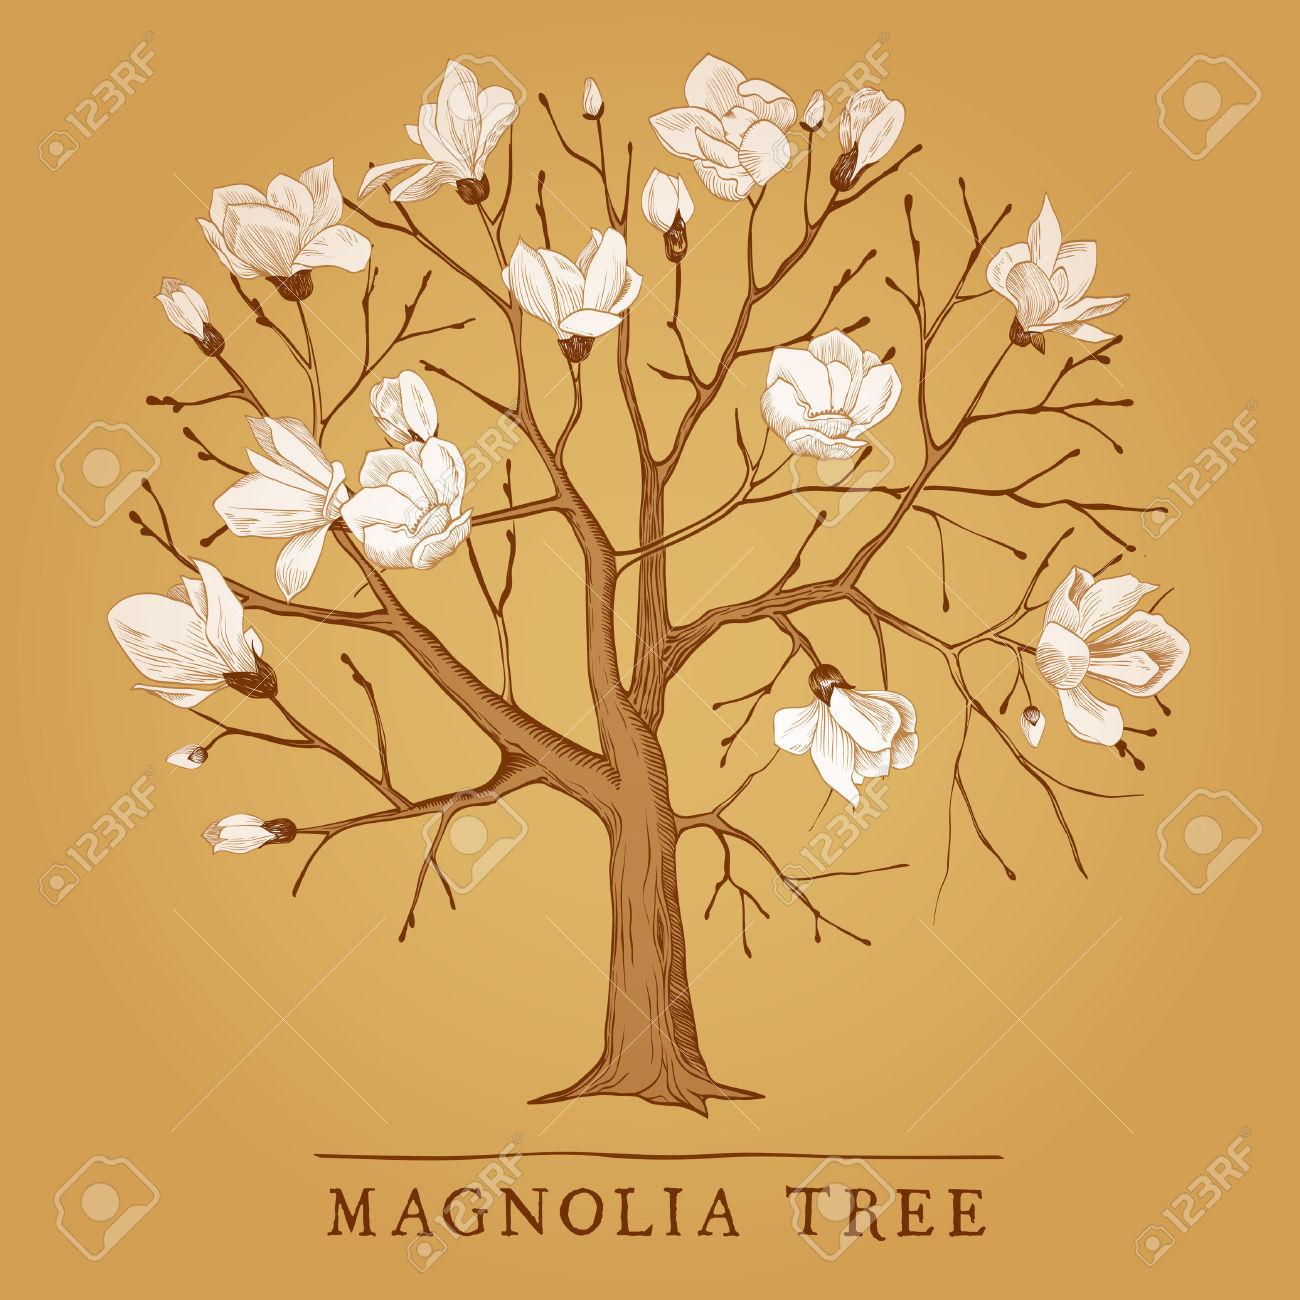 917 Magnolia Tree Cliparts, Stock Vector And Royalty Free Magnolia.